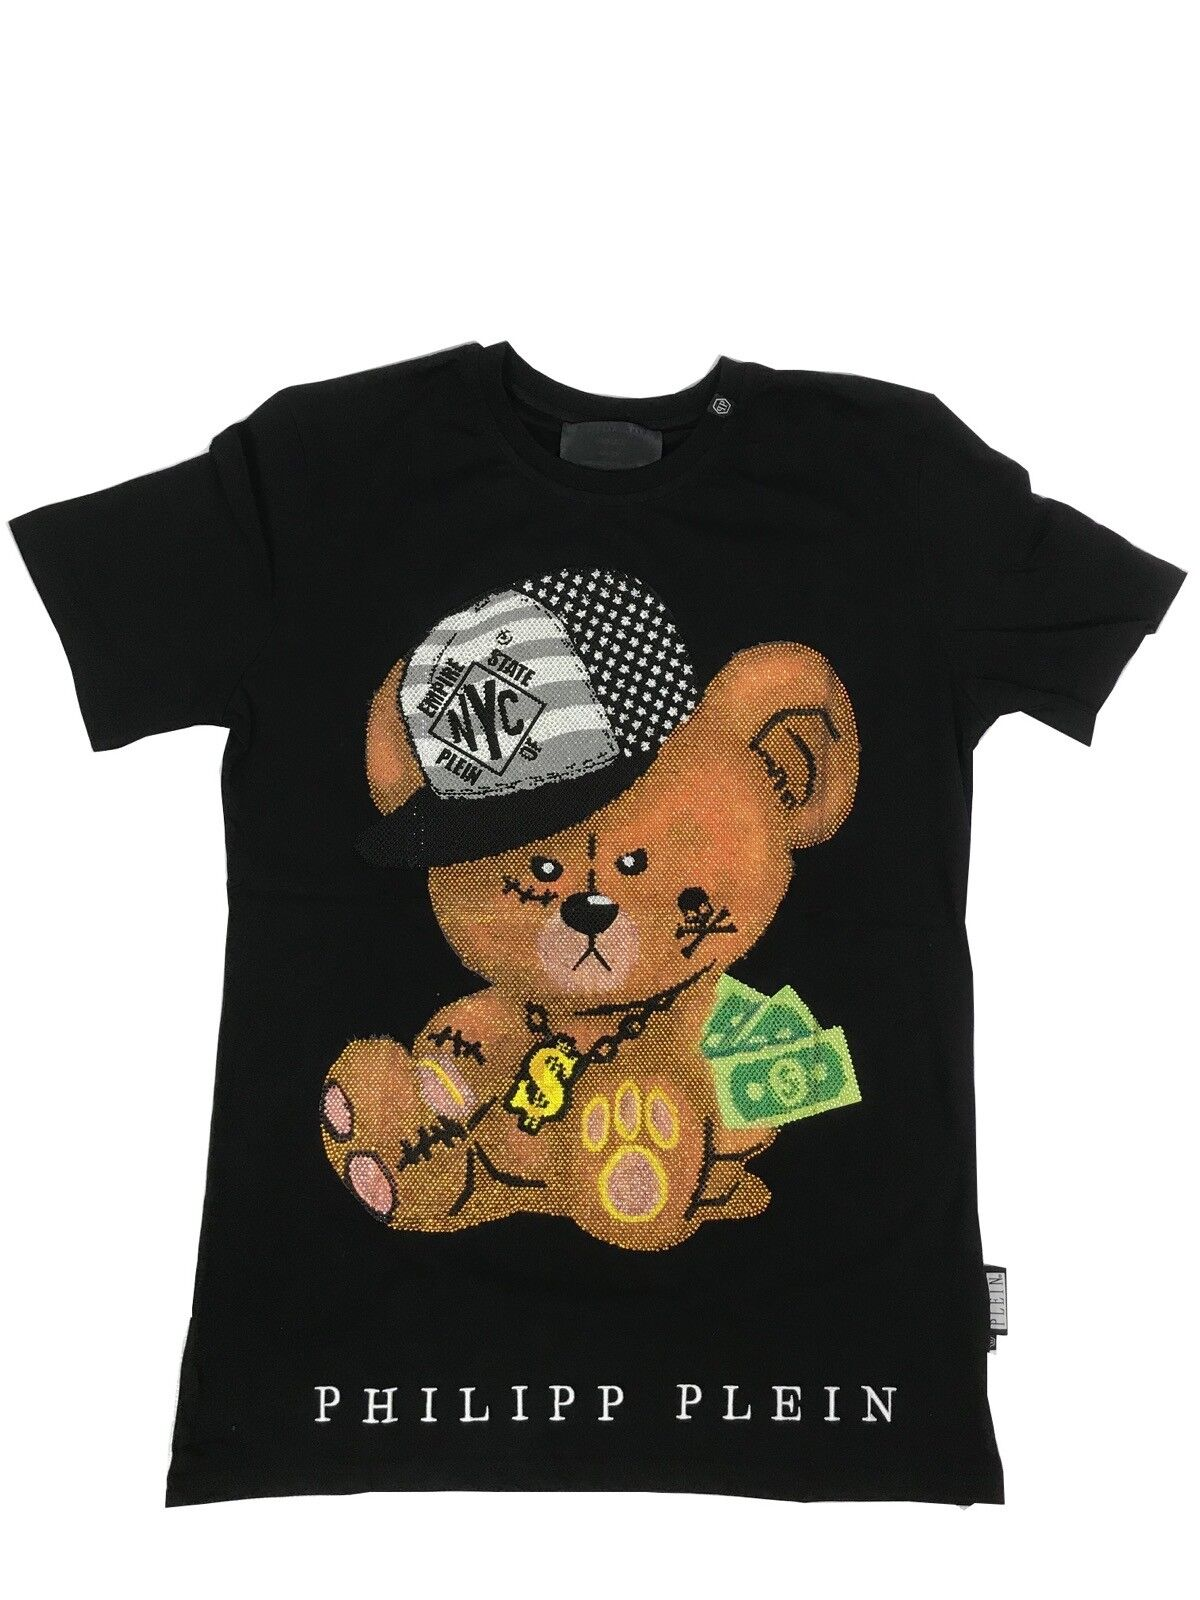 bd2319ecaa759 Philipp Philipp Philipp Plein T-shirt col rond bébé noir taille XL f6ec0e